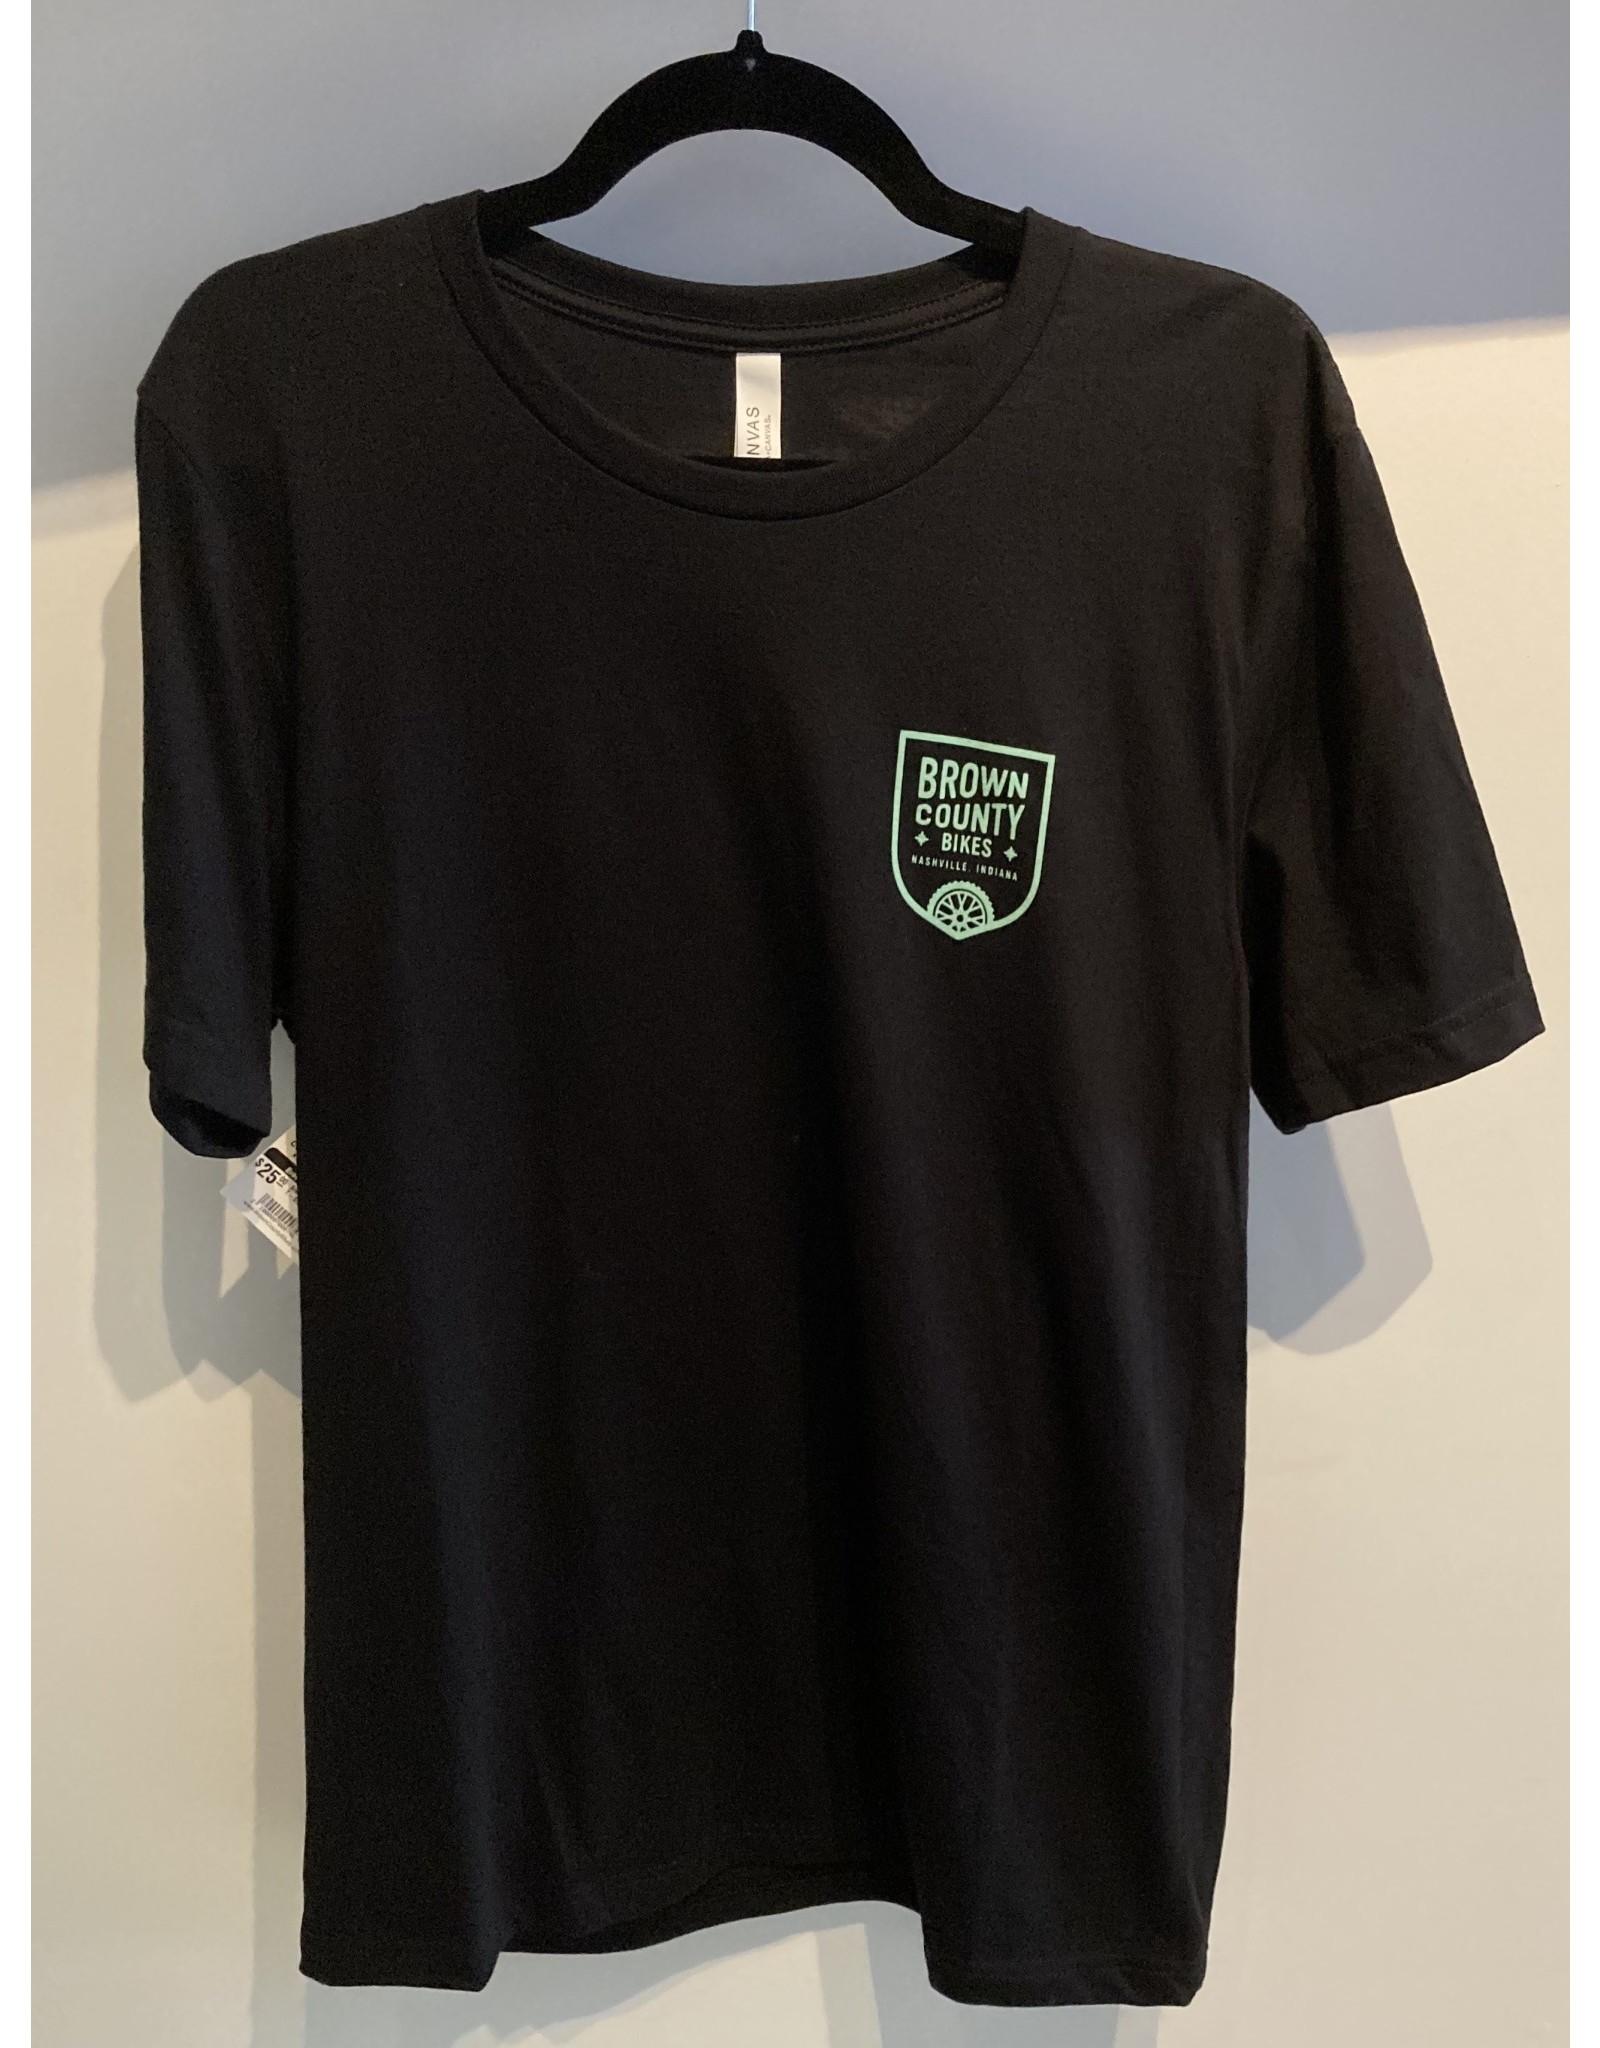 Brown County Bikes Black T-Shirt